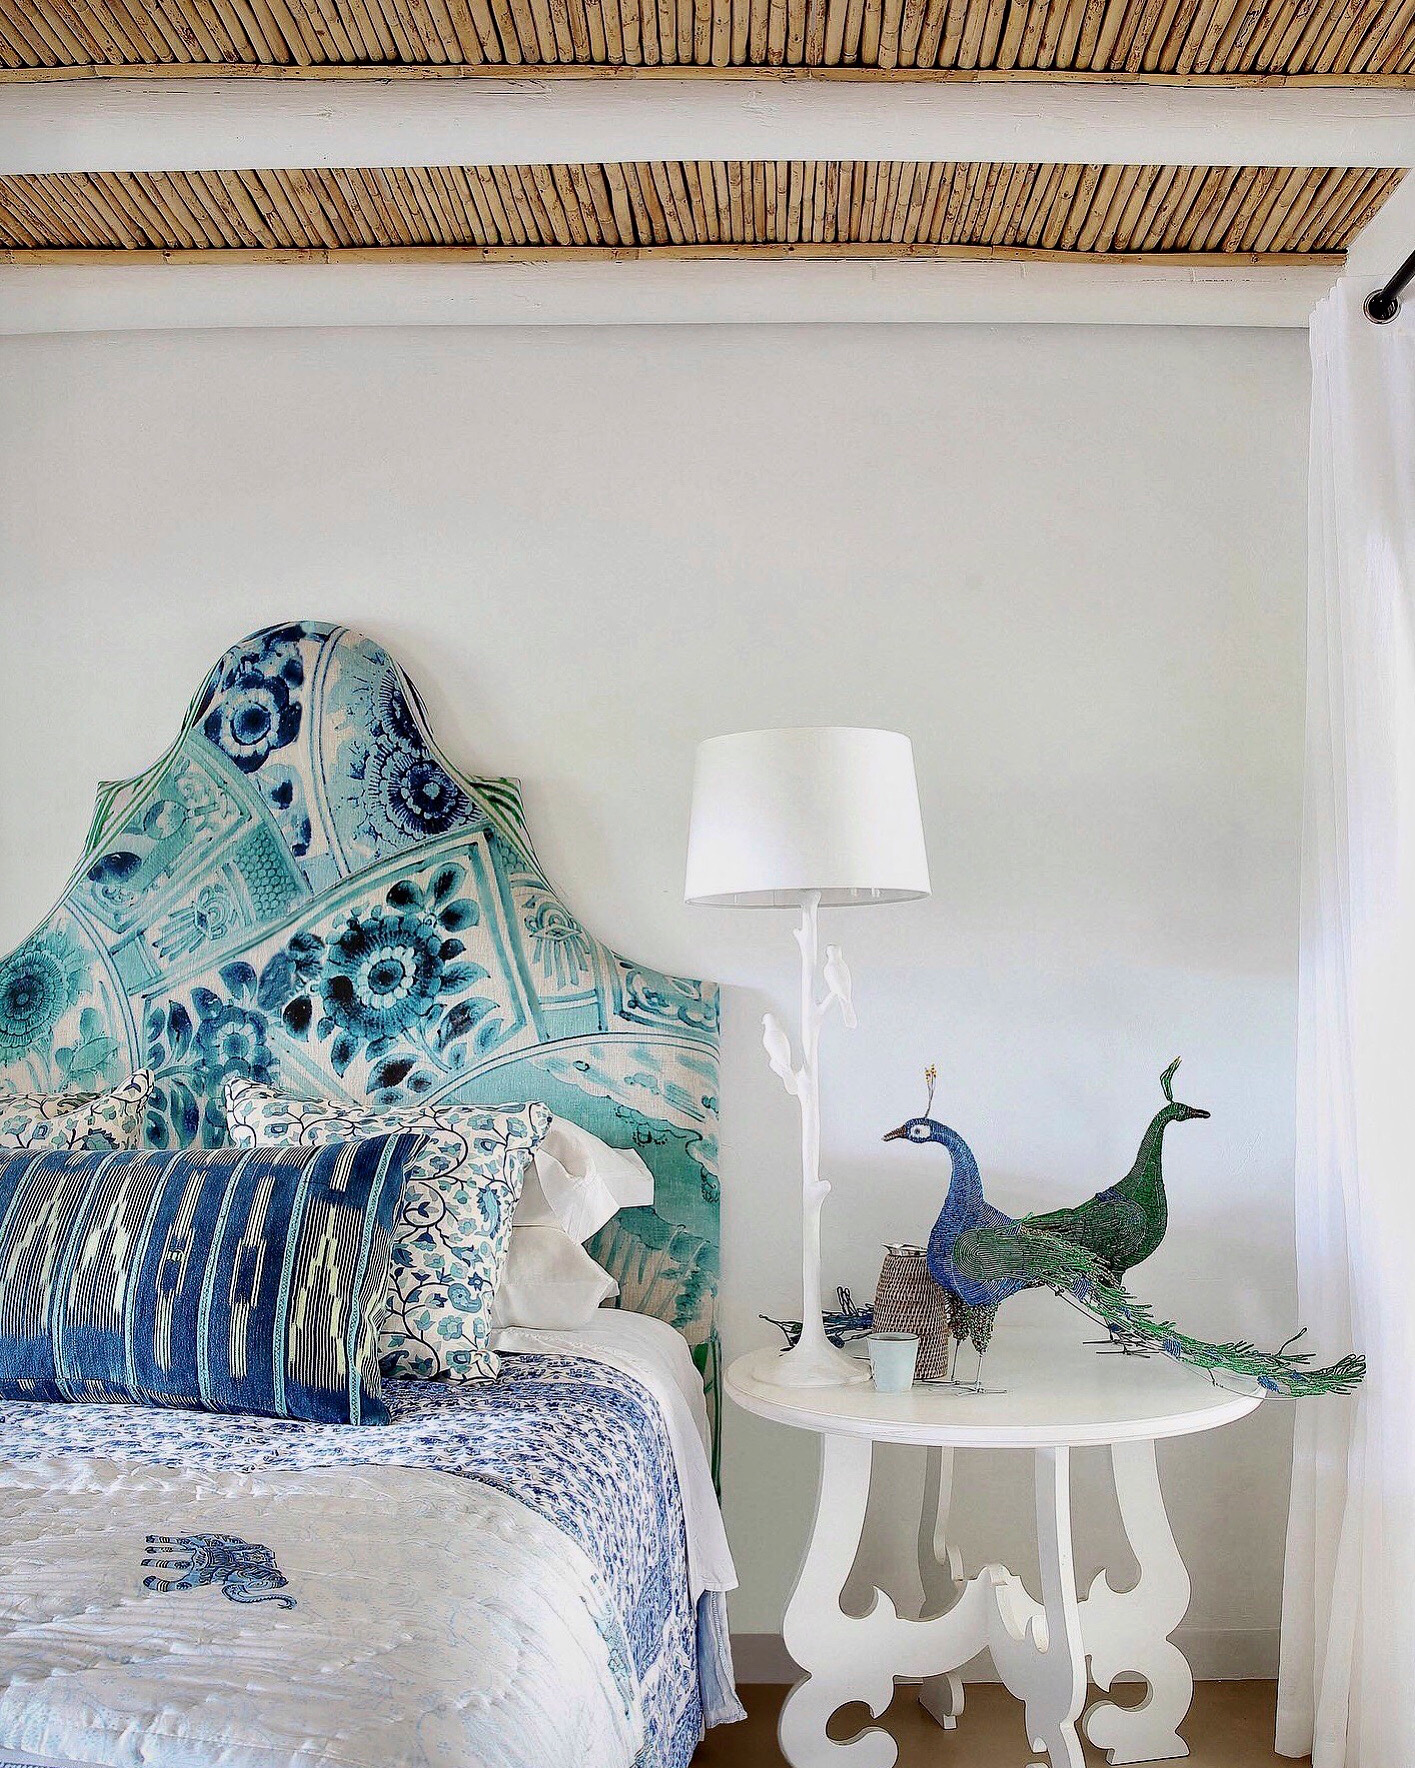 Botanica Trading, Aqua, Emerald, Duck Deer headboard, Bedroom, Decorate, Decor, Bedding, Scatter cushions, Accessories